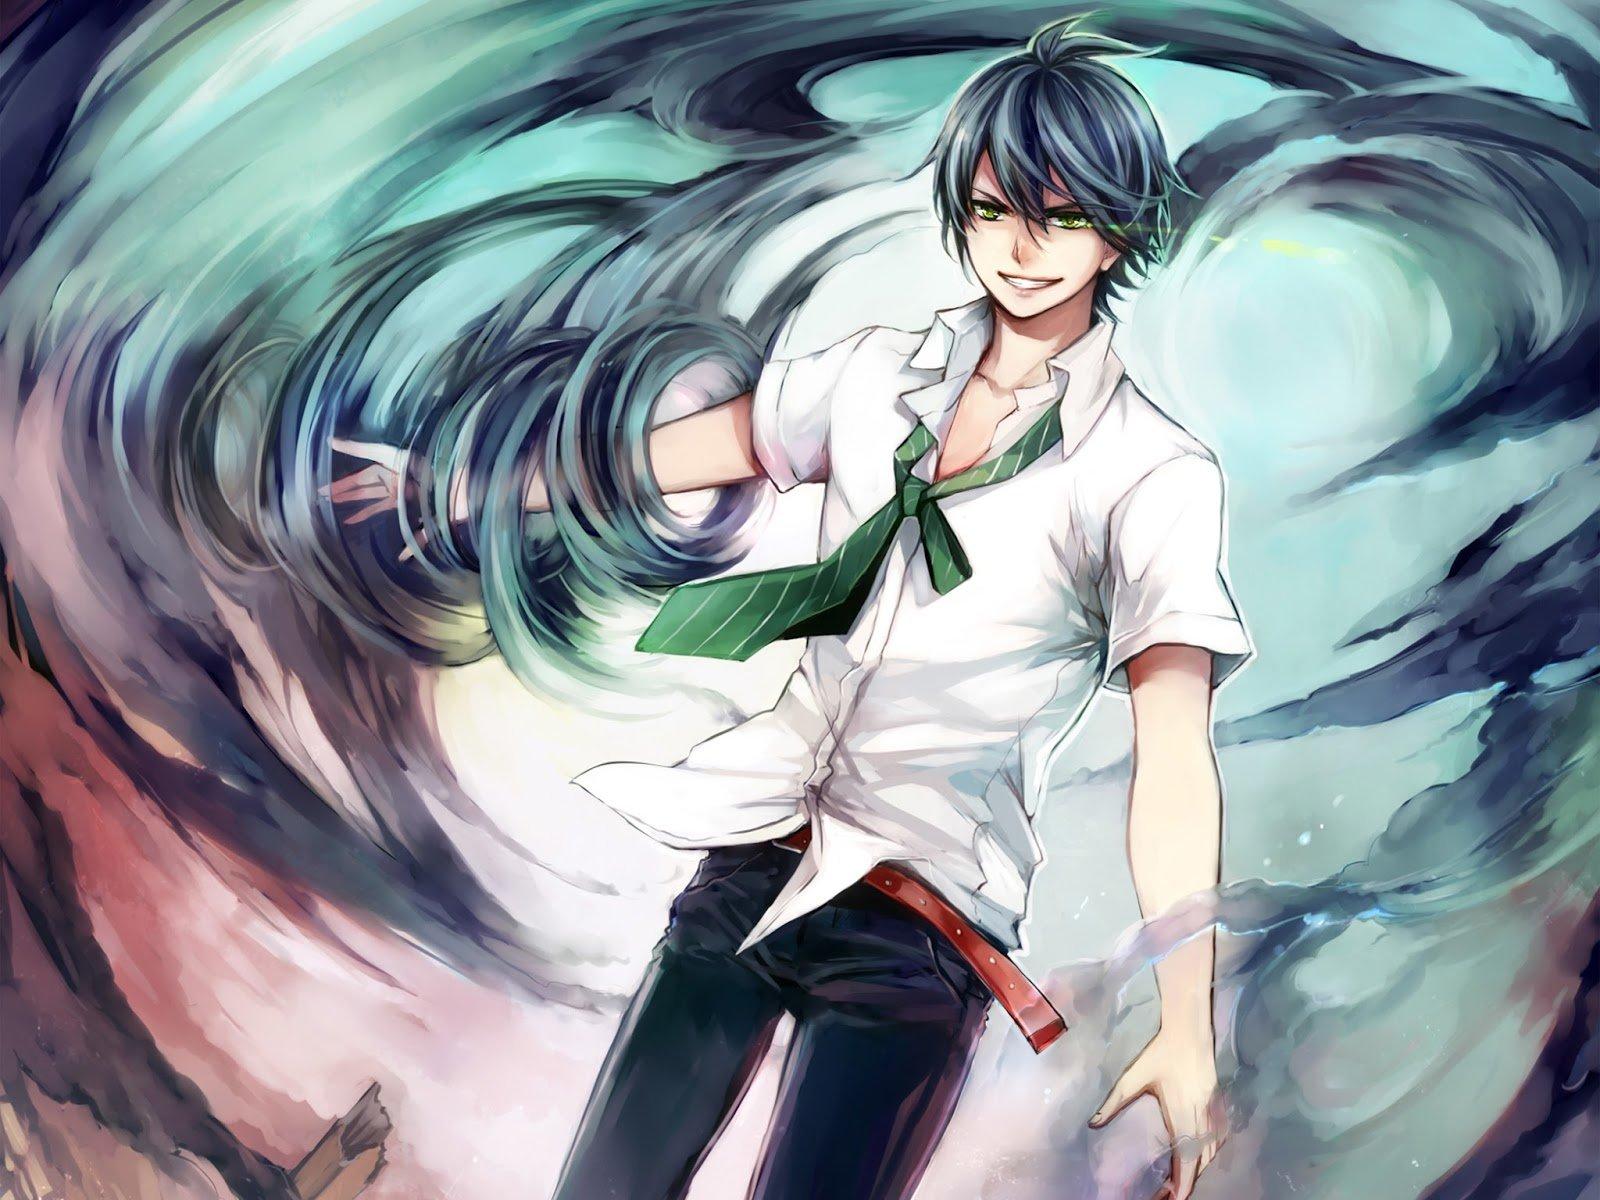 Anime Characters Powers : Anime guy wallpaper hd wallpapersafari